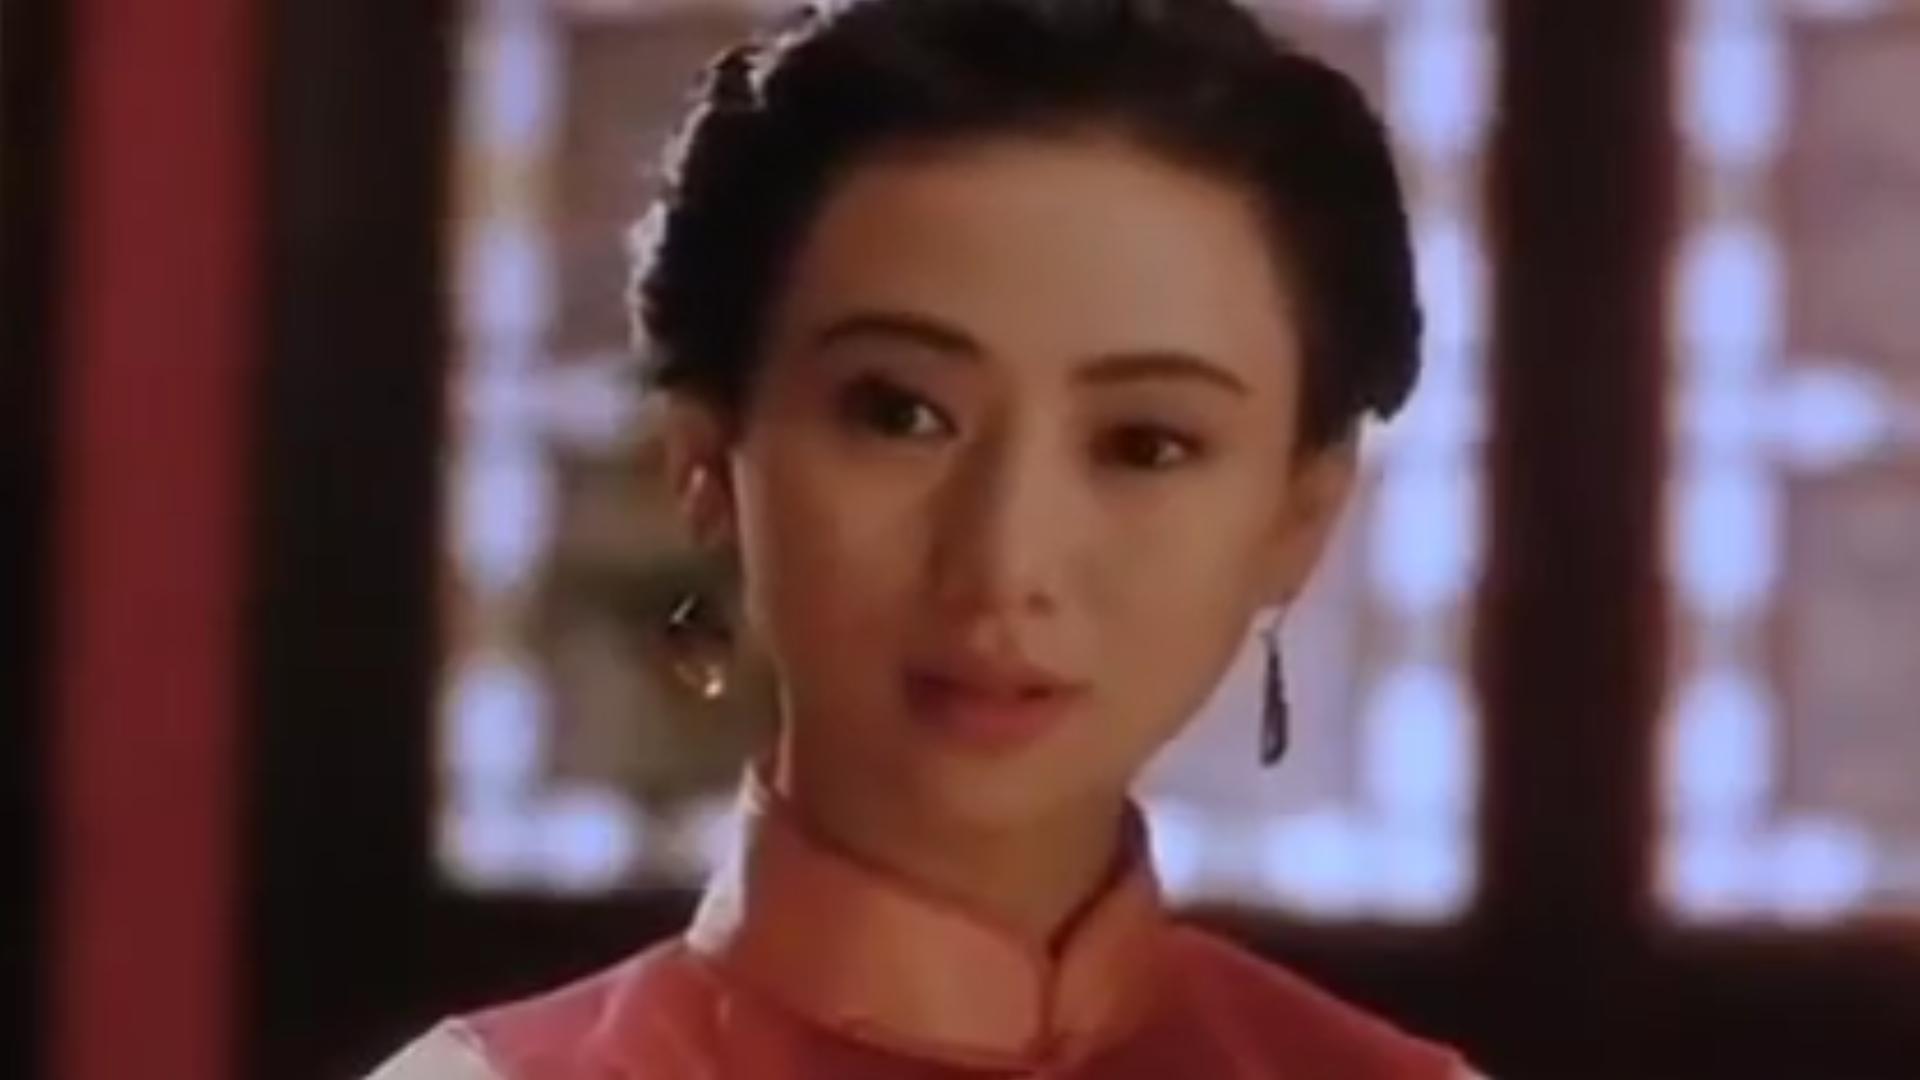 Yvonne Hung Yung in Moon ching sap dai huk ying (1994)